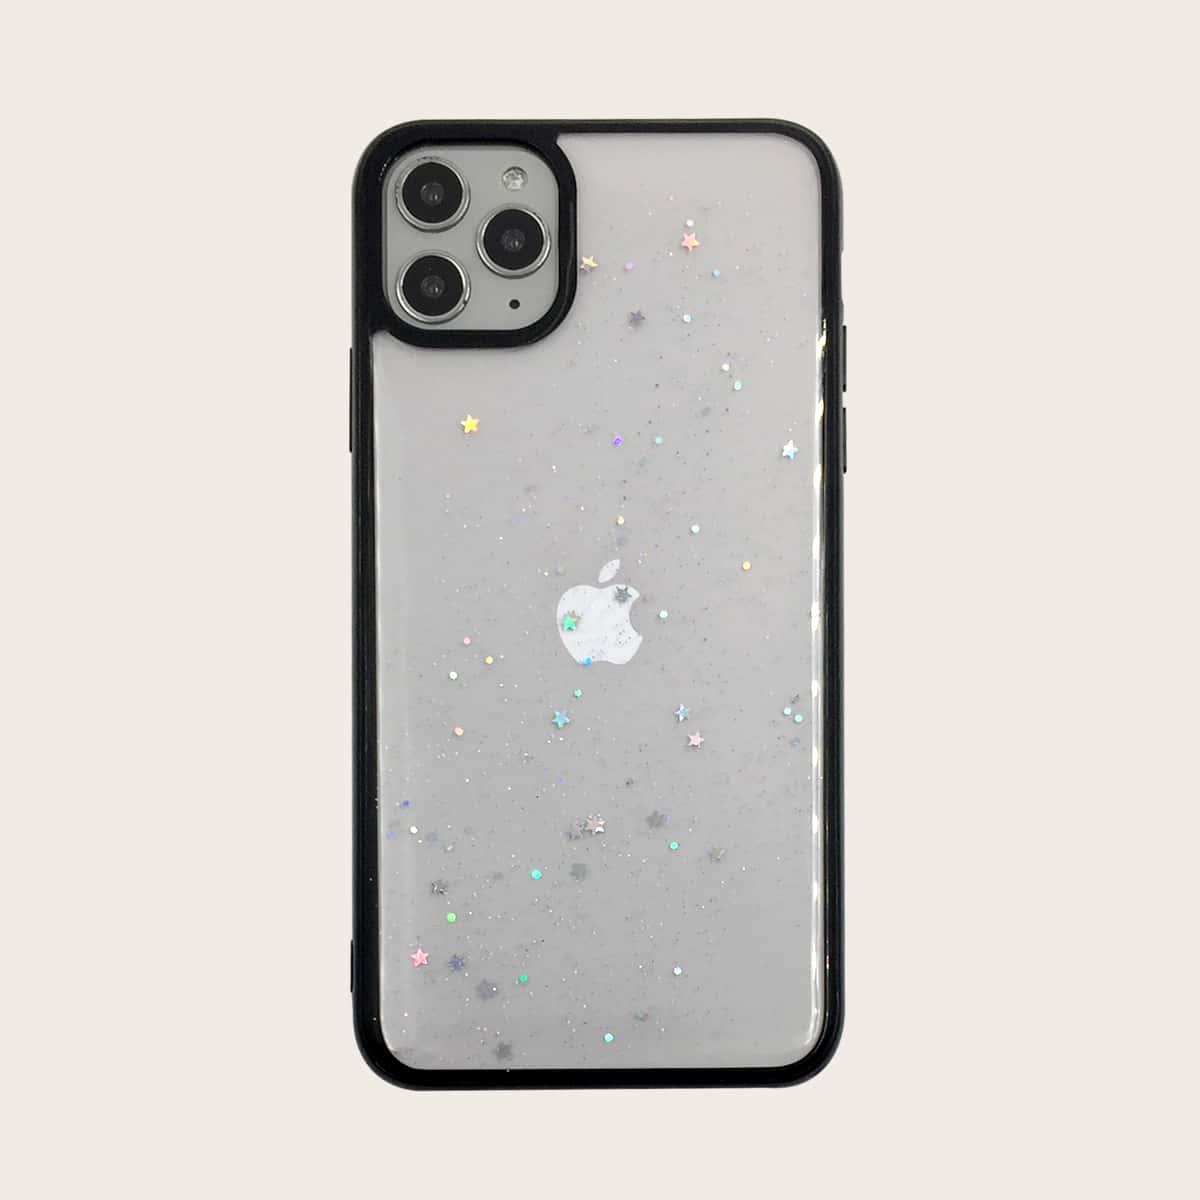 Блестящий прозрачный чехол для iPhone 1шт фото